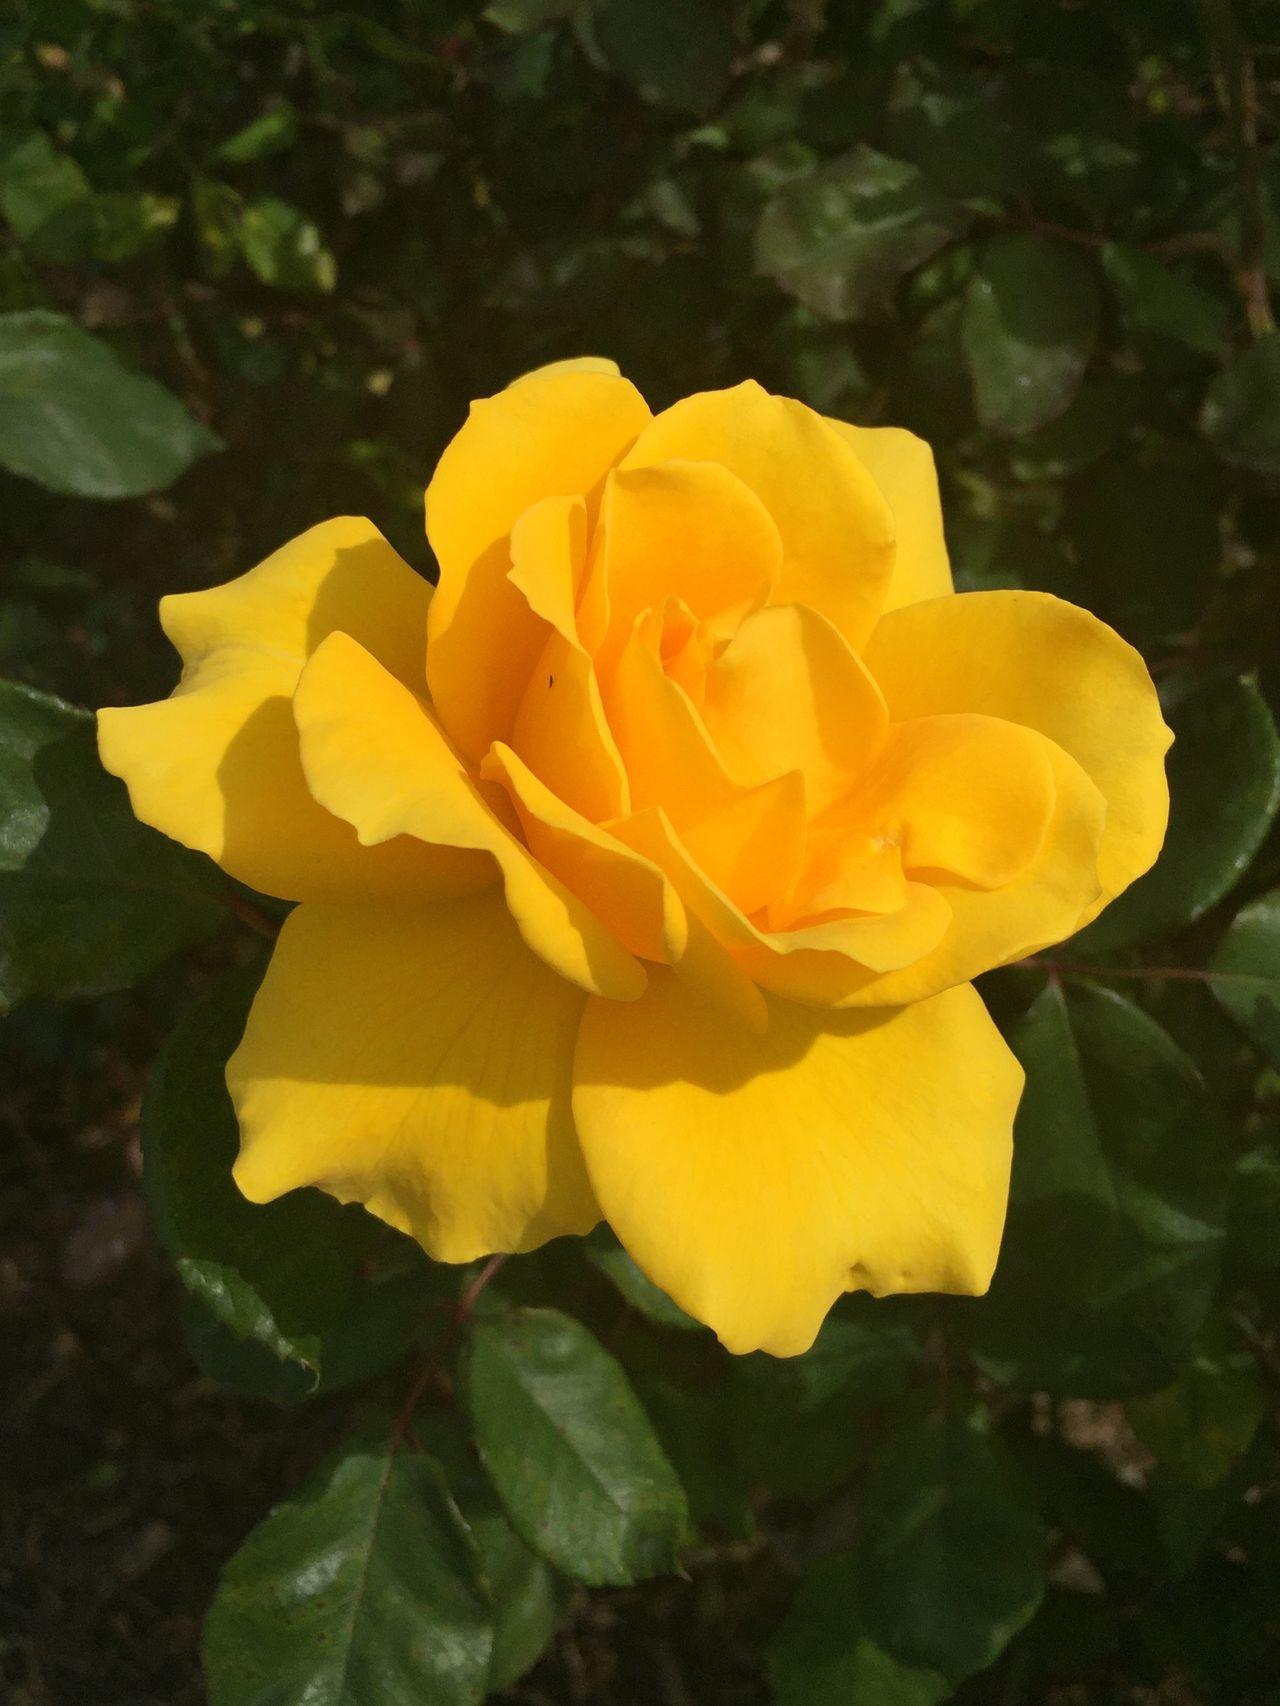 Yellow Flower Yellow Roses Yellow Rose Nature California United States Beautiful Beauty